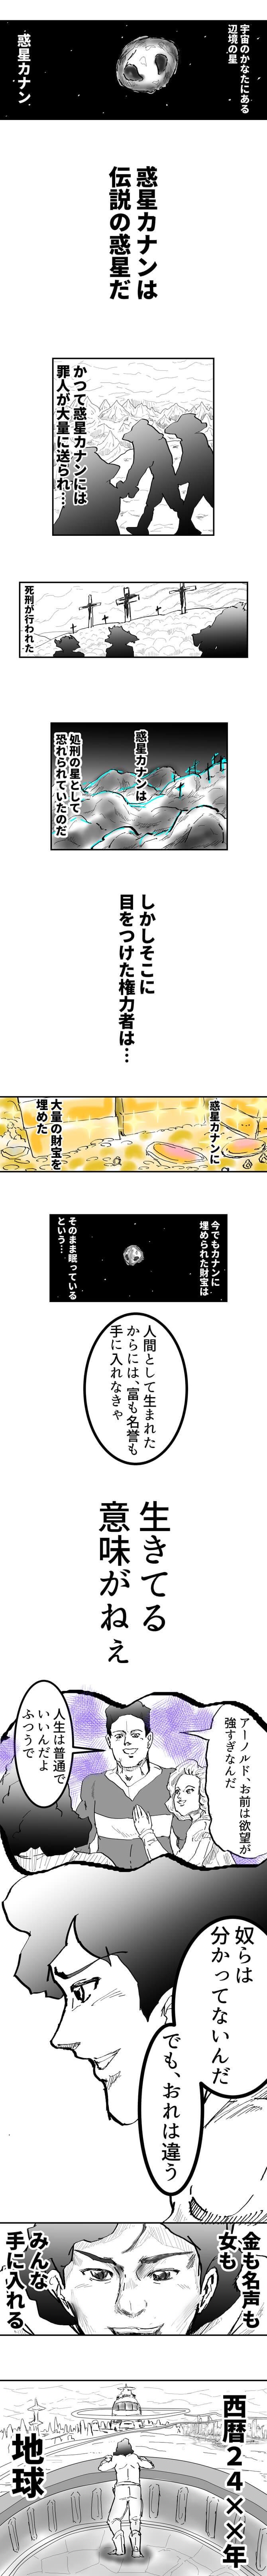 web漫画「惑星カナン」第1話